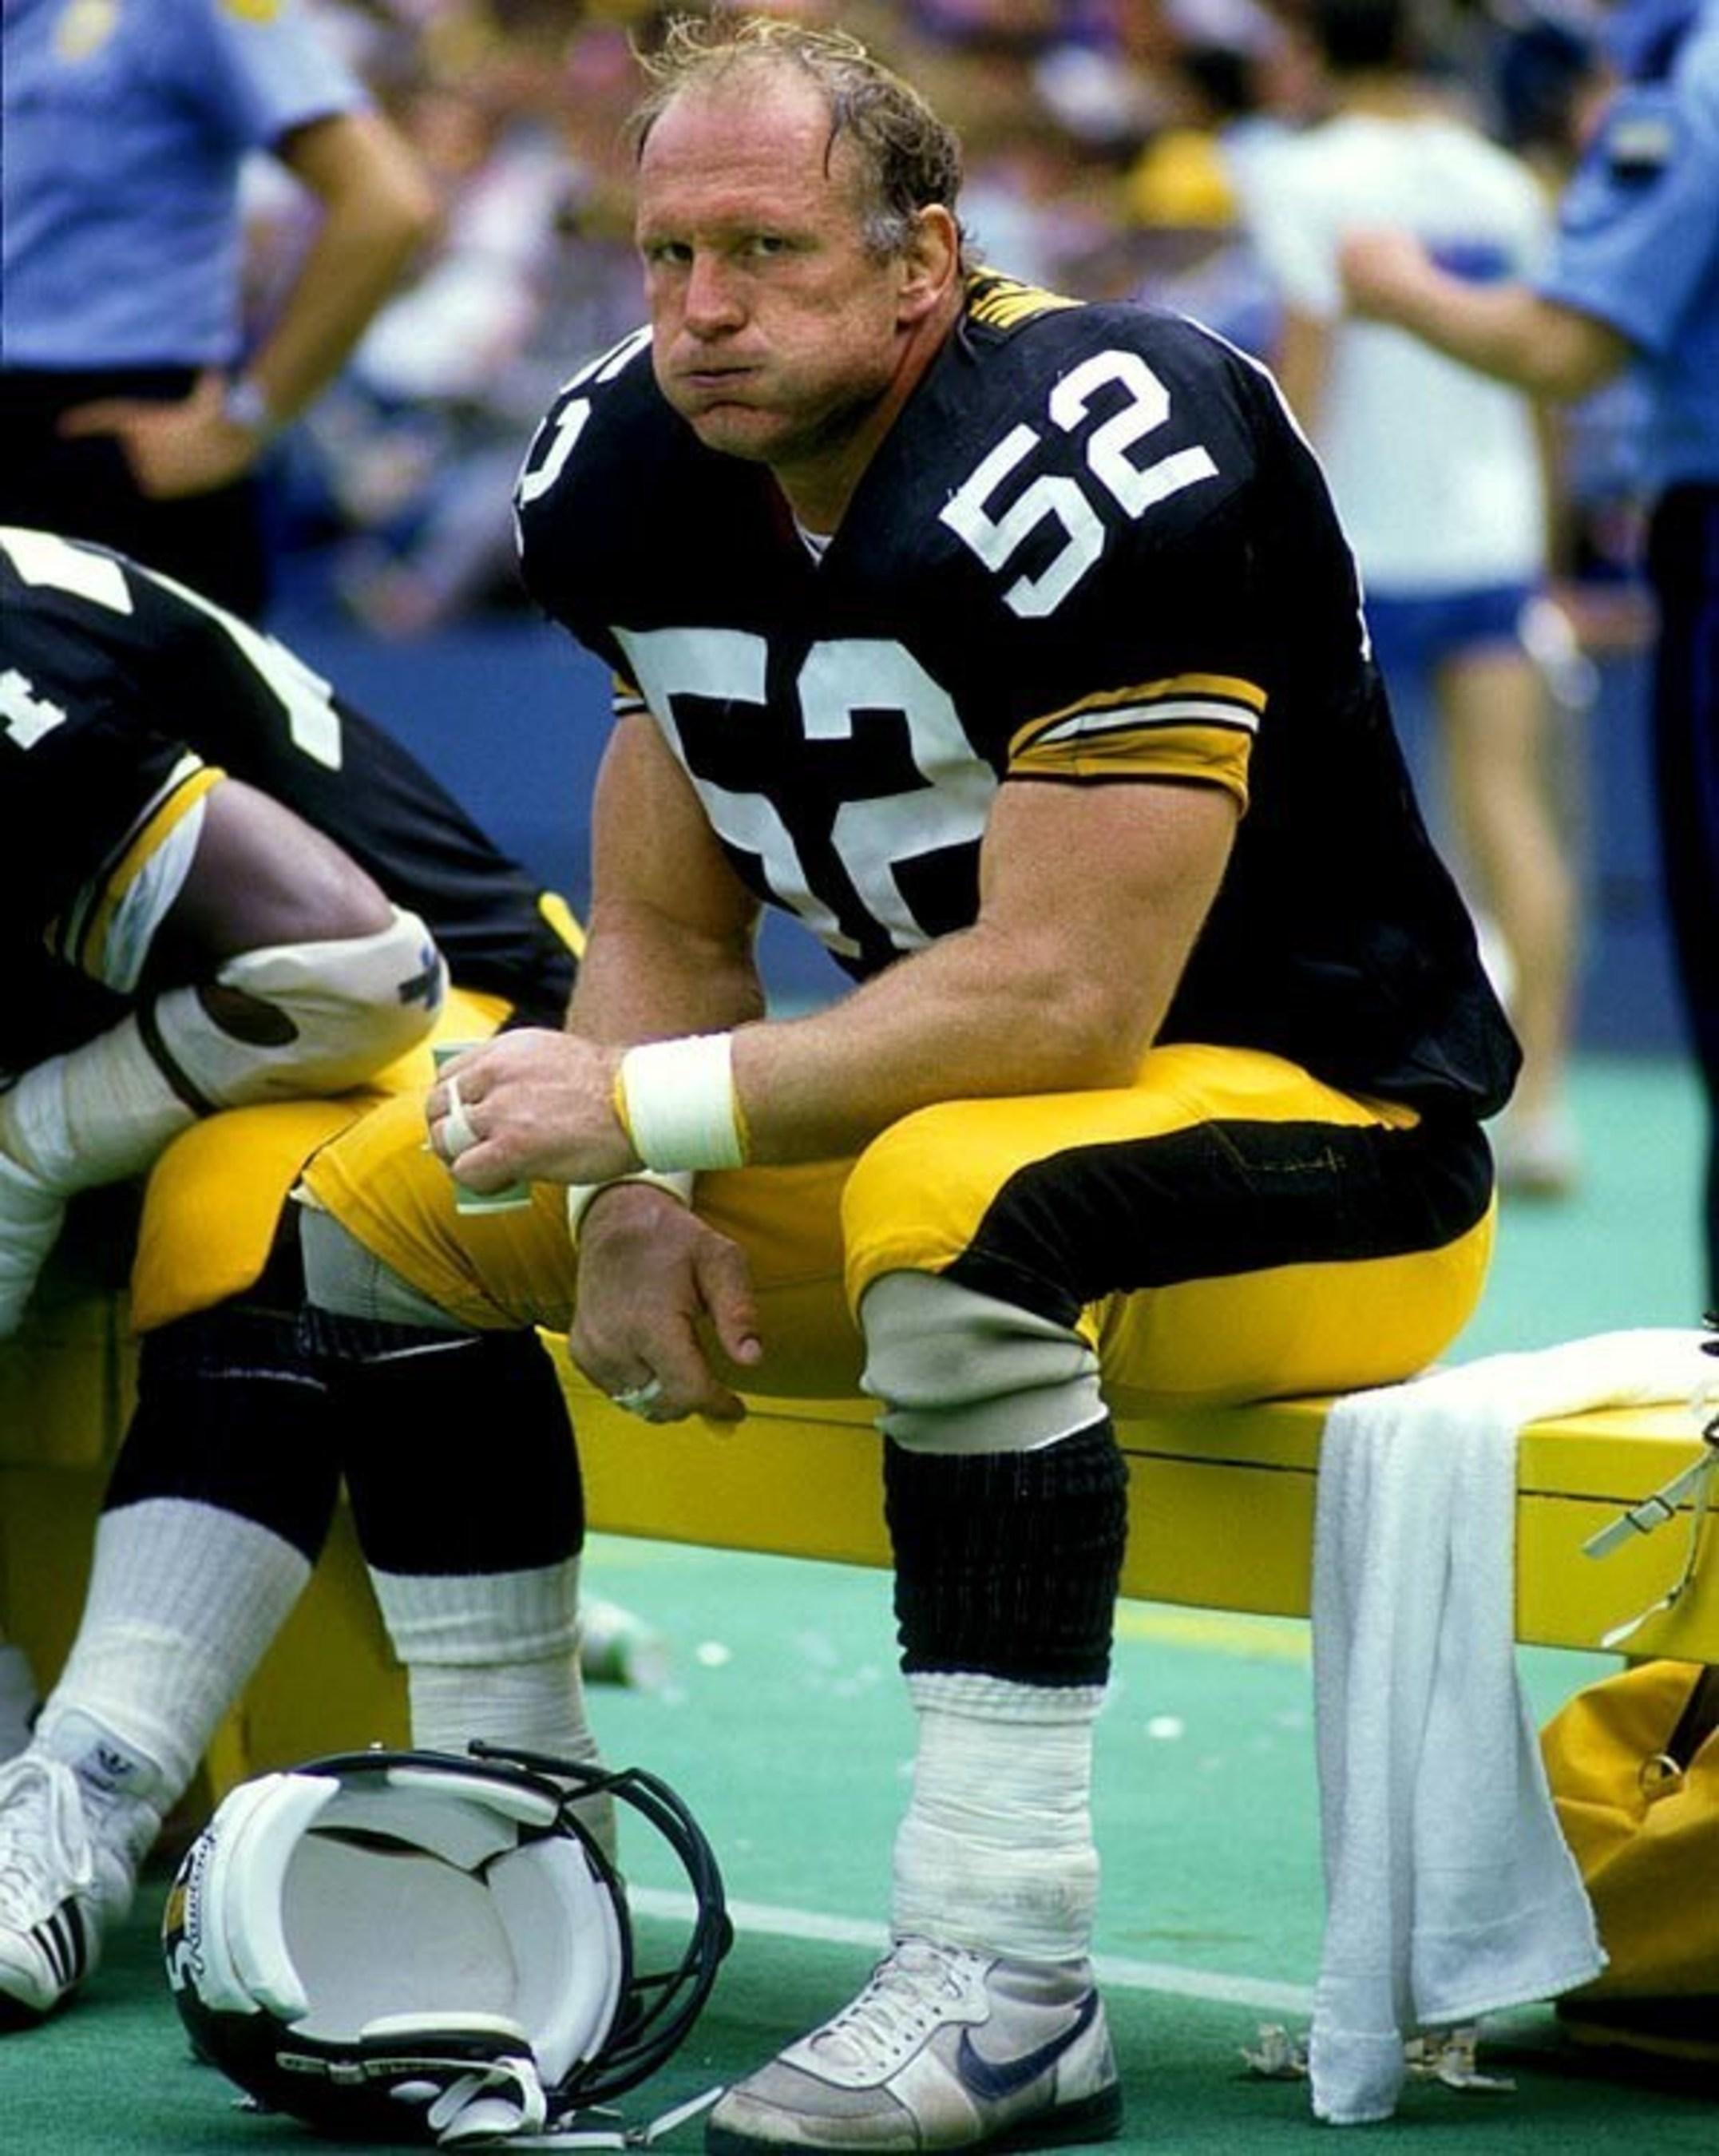 Posse Films Announces Film about NFL Legend 'Iron' Mike Webster